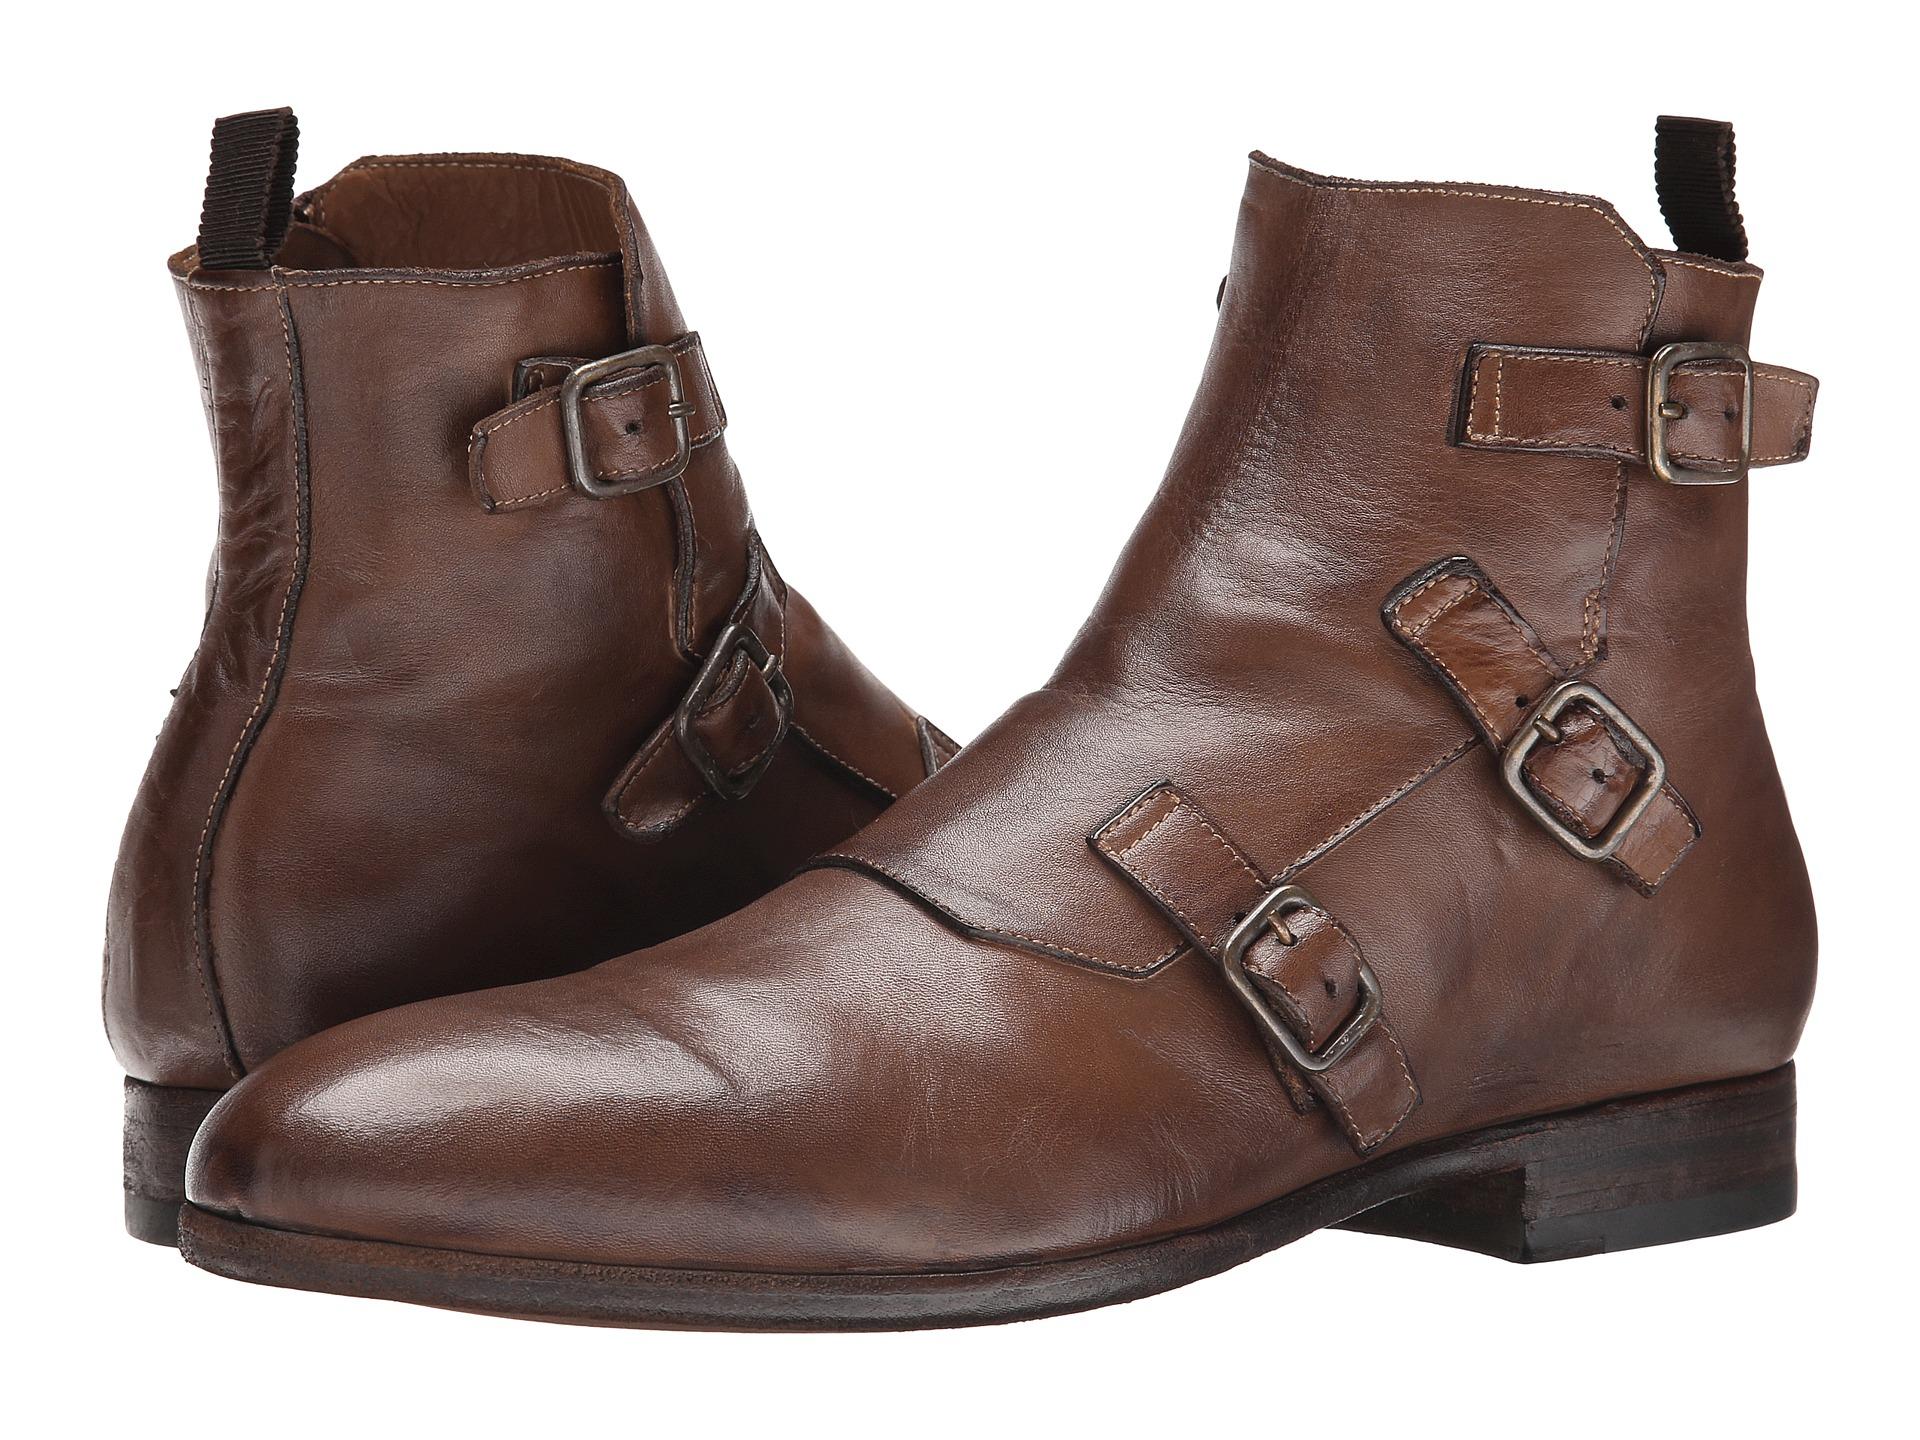 4e1e4d4ac6a6e Alexander McQueen Triple Buckle Monk Boot in Brown for Men - Lyst